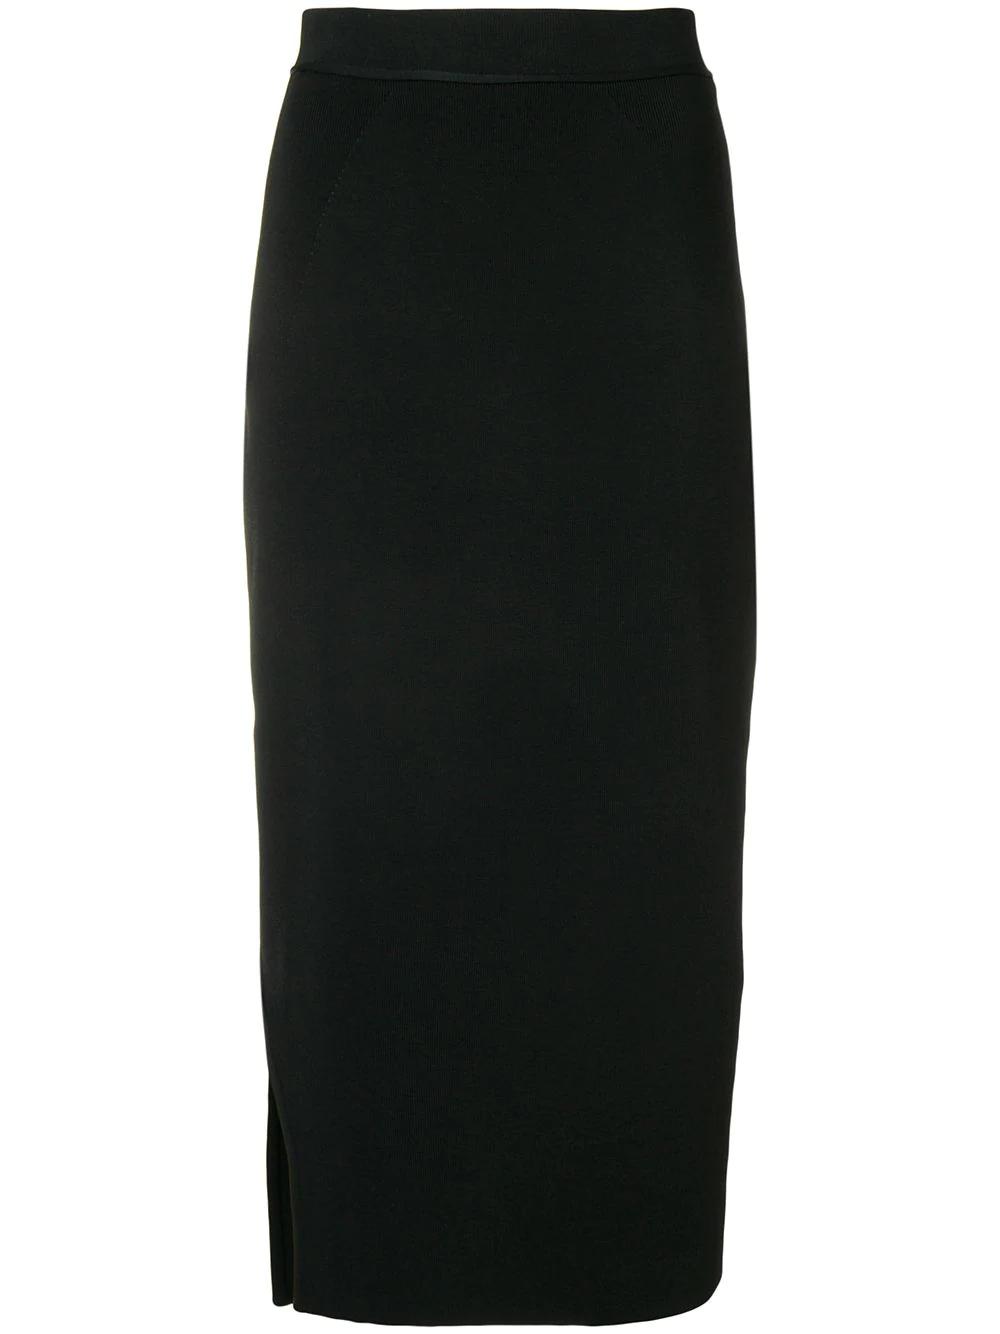 Victoria Beckham | юбка-карандаш с боковым разрезом | Clouty